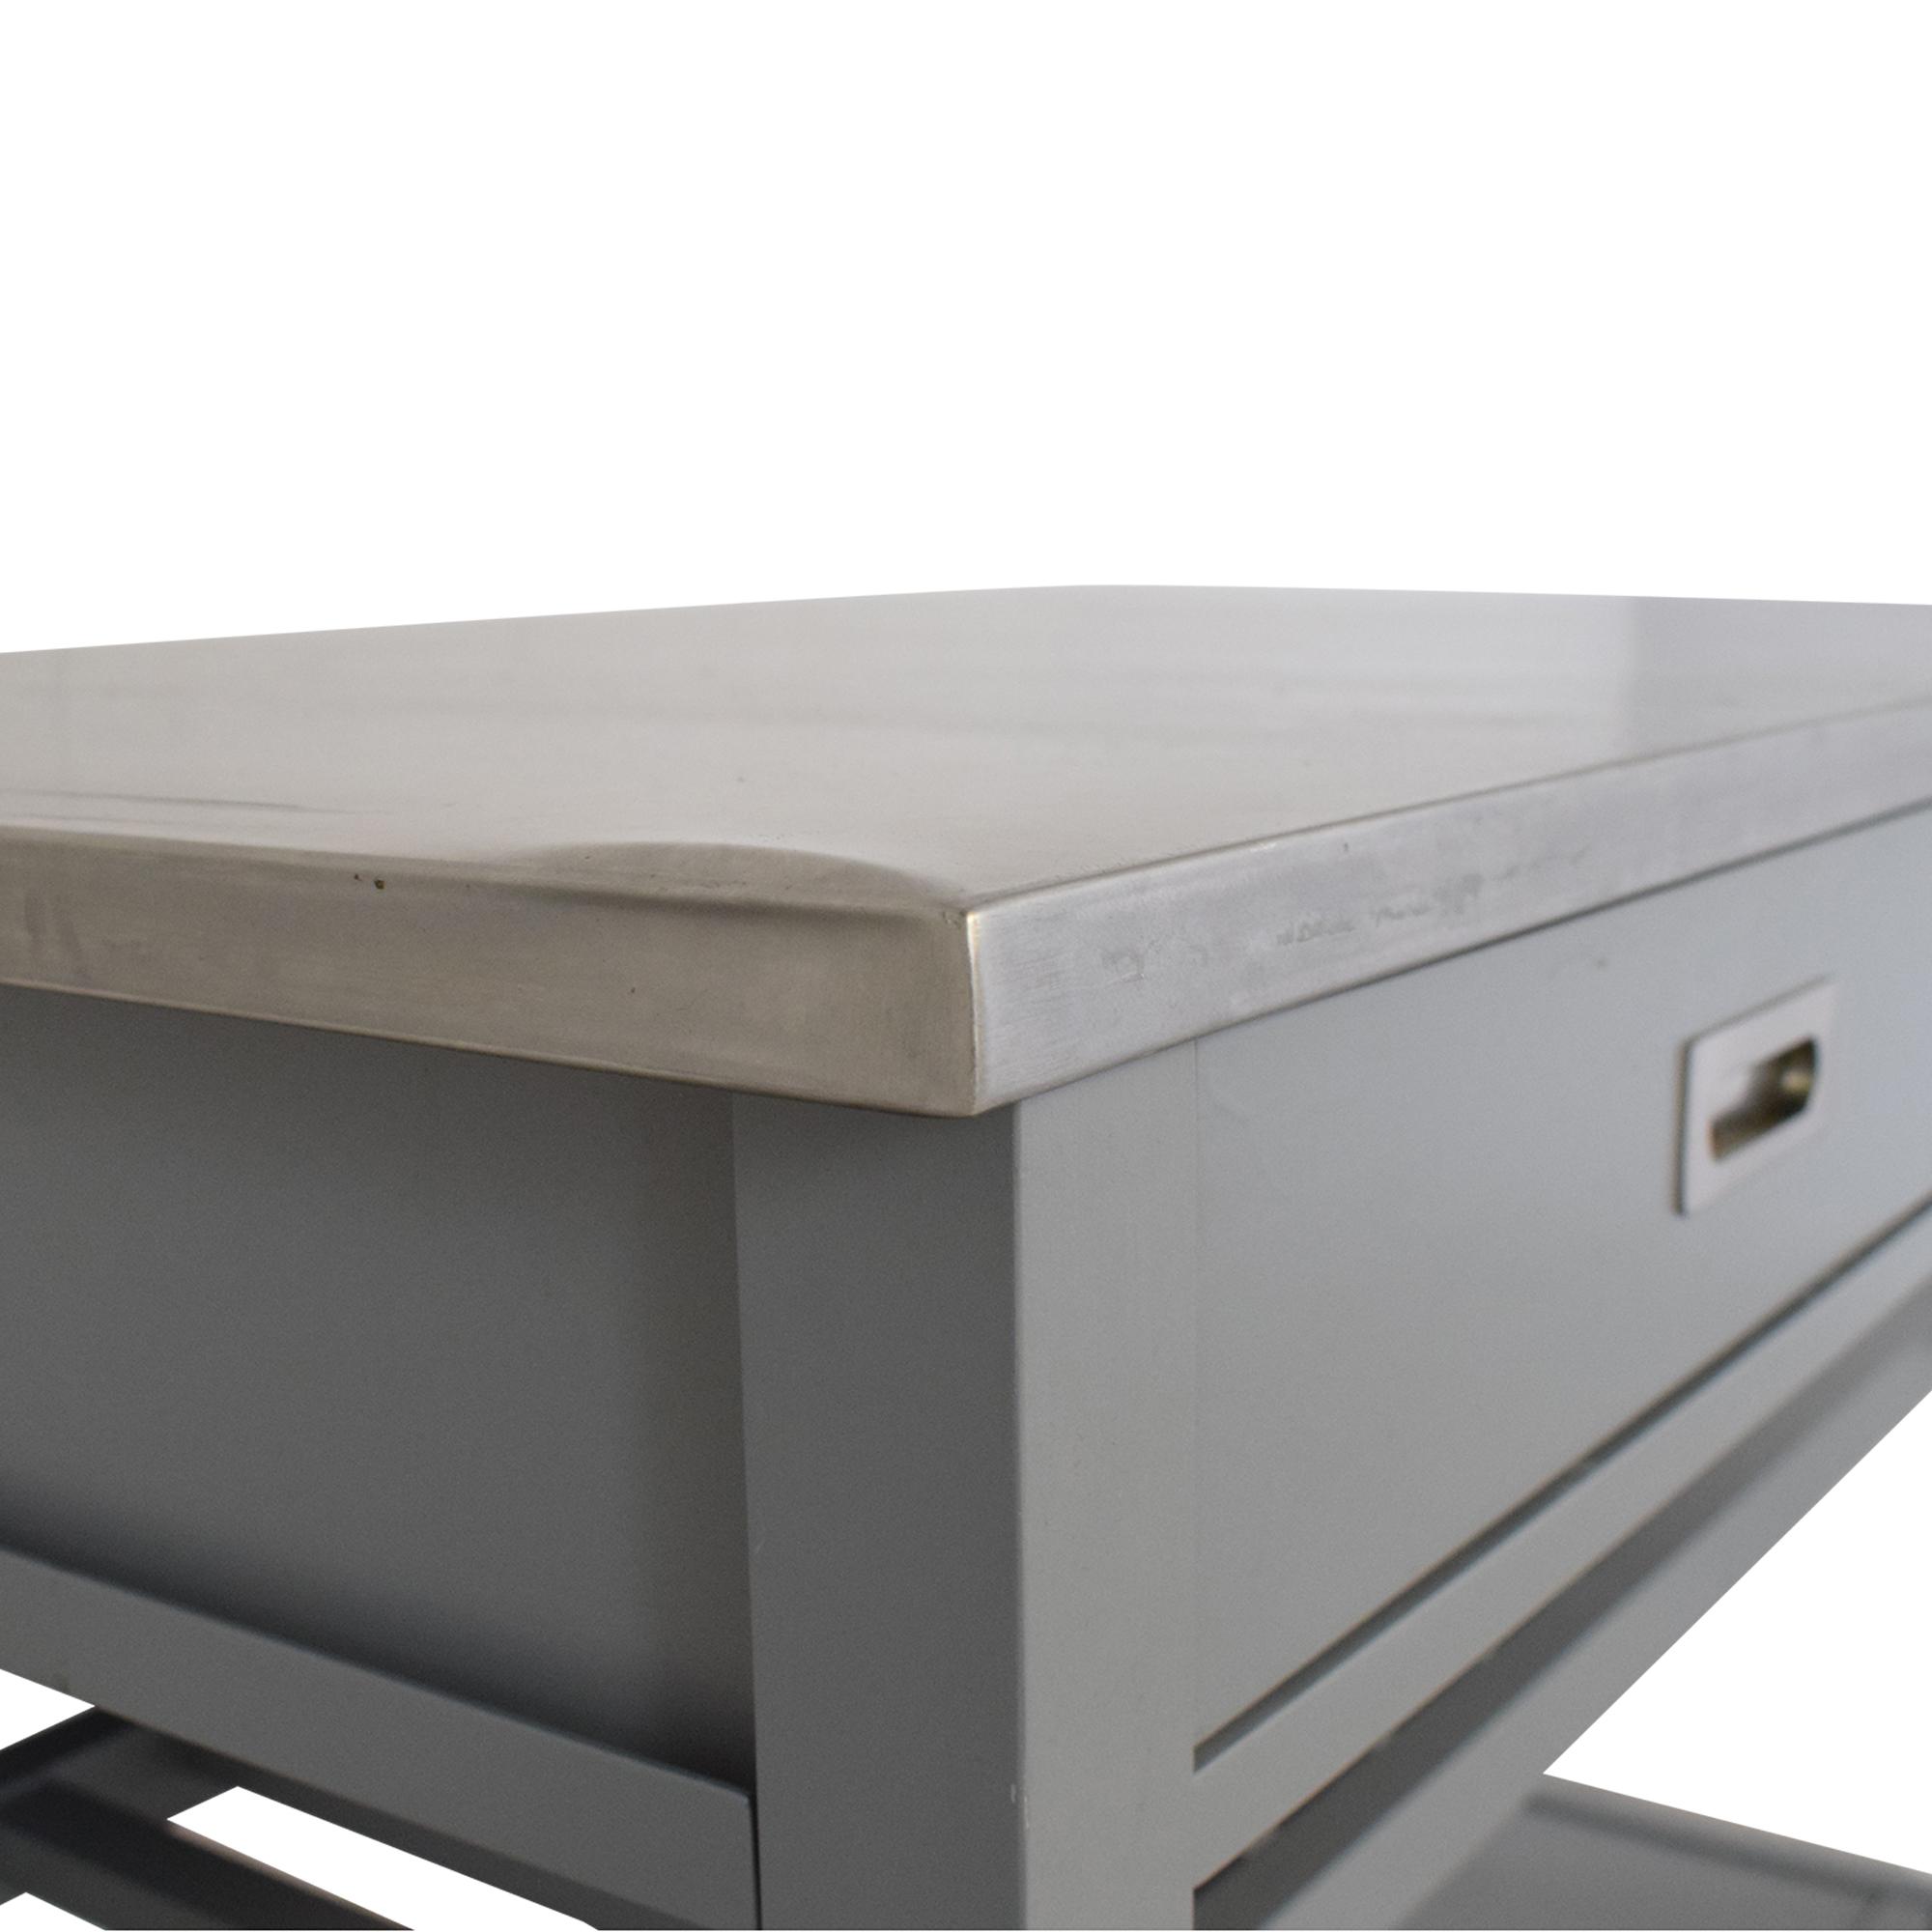 Crate & Barrel Belmont Open Kitchen Island / Tables